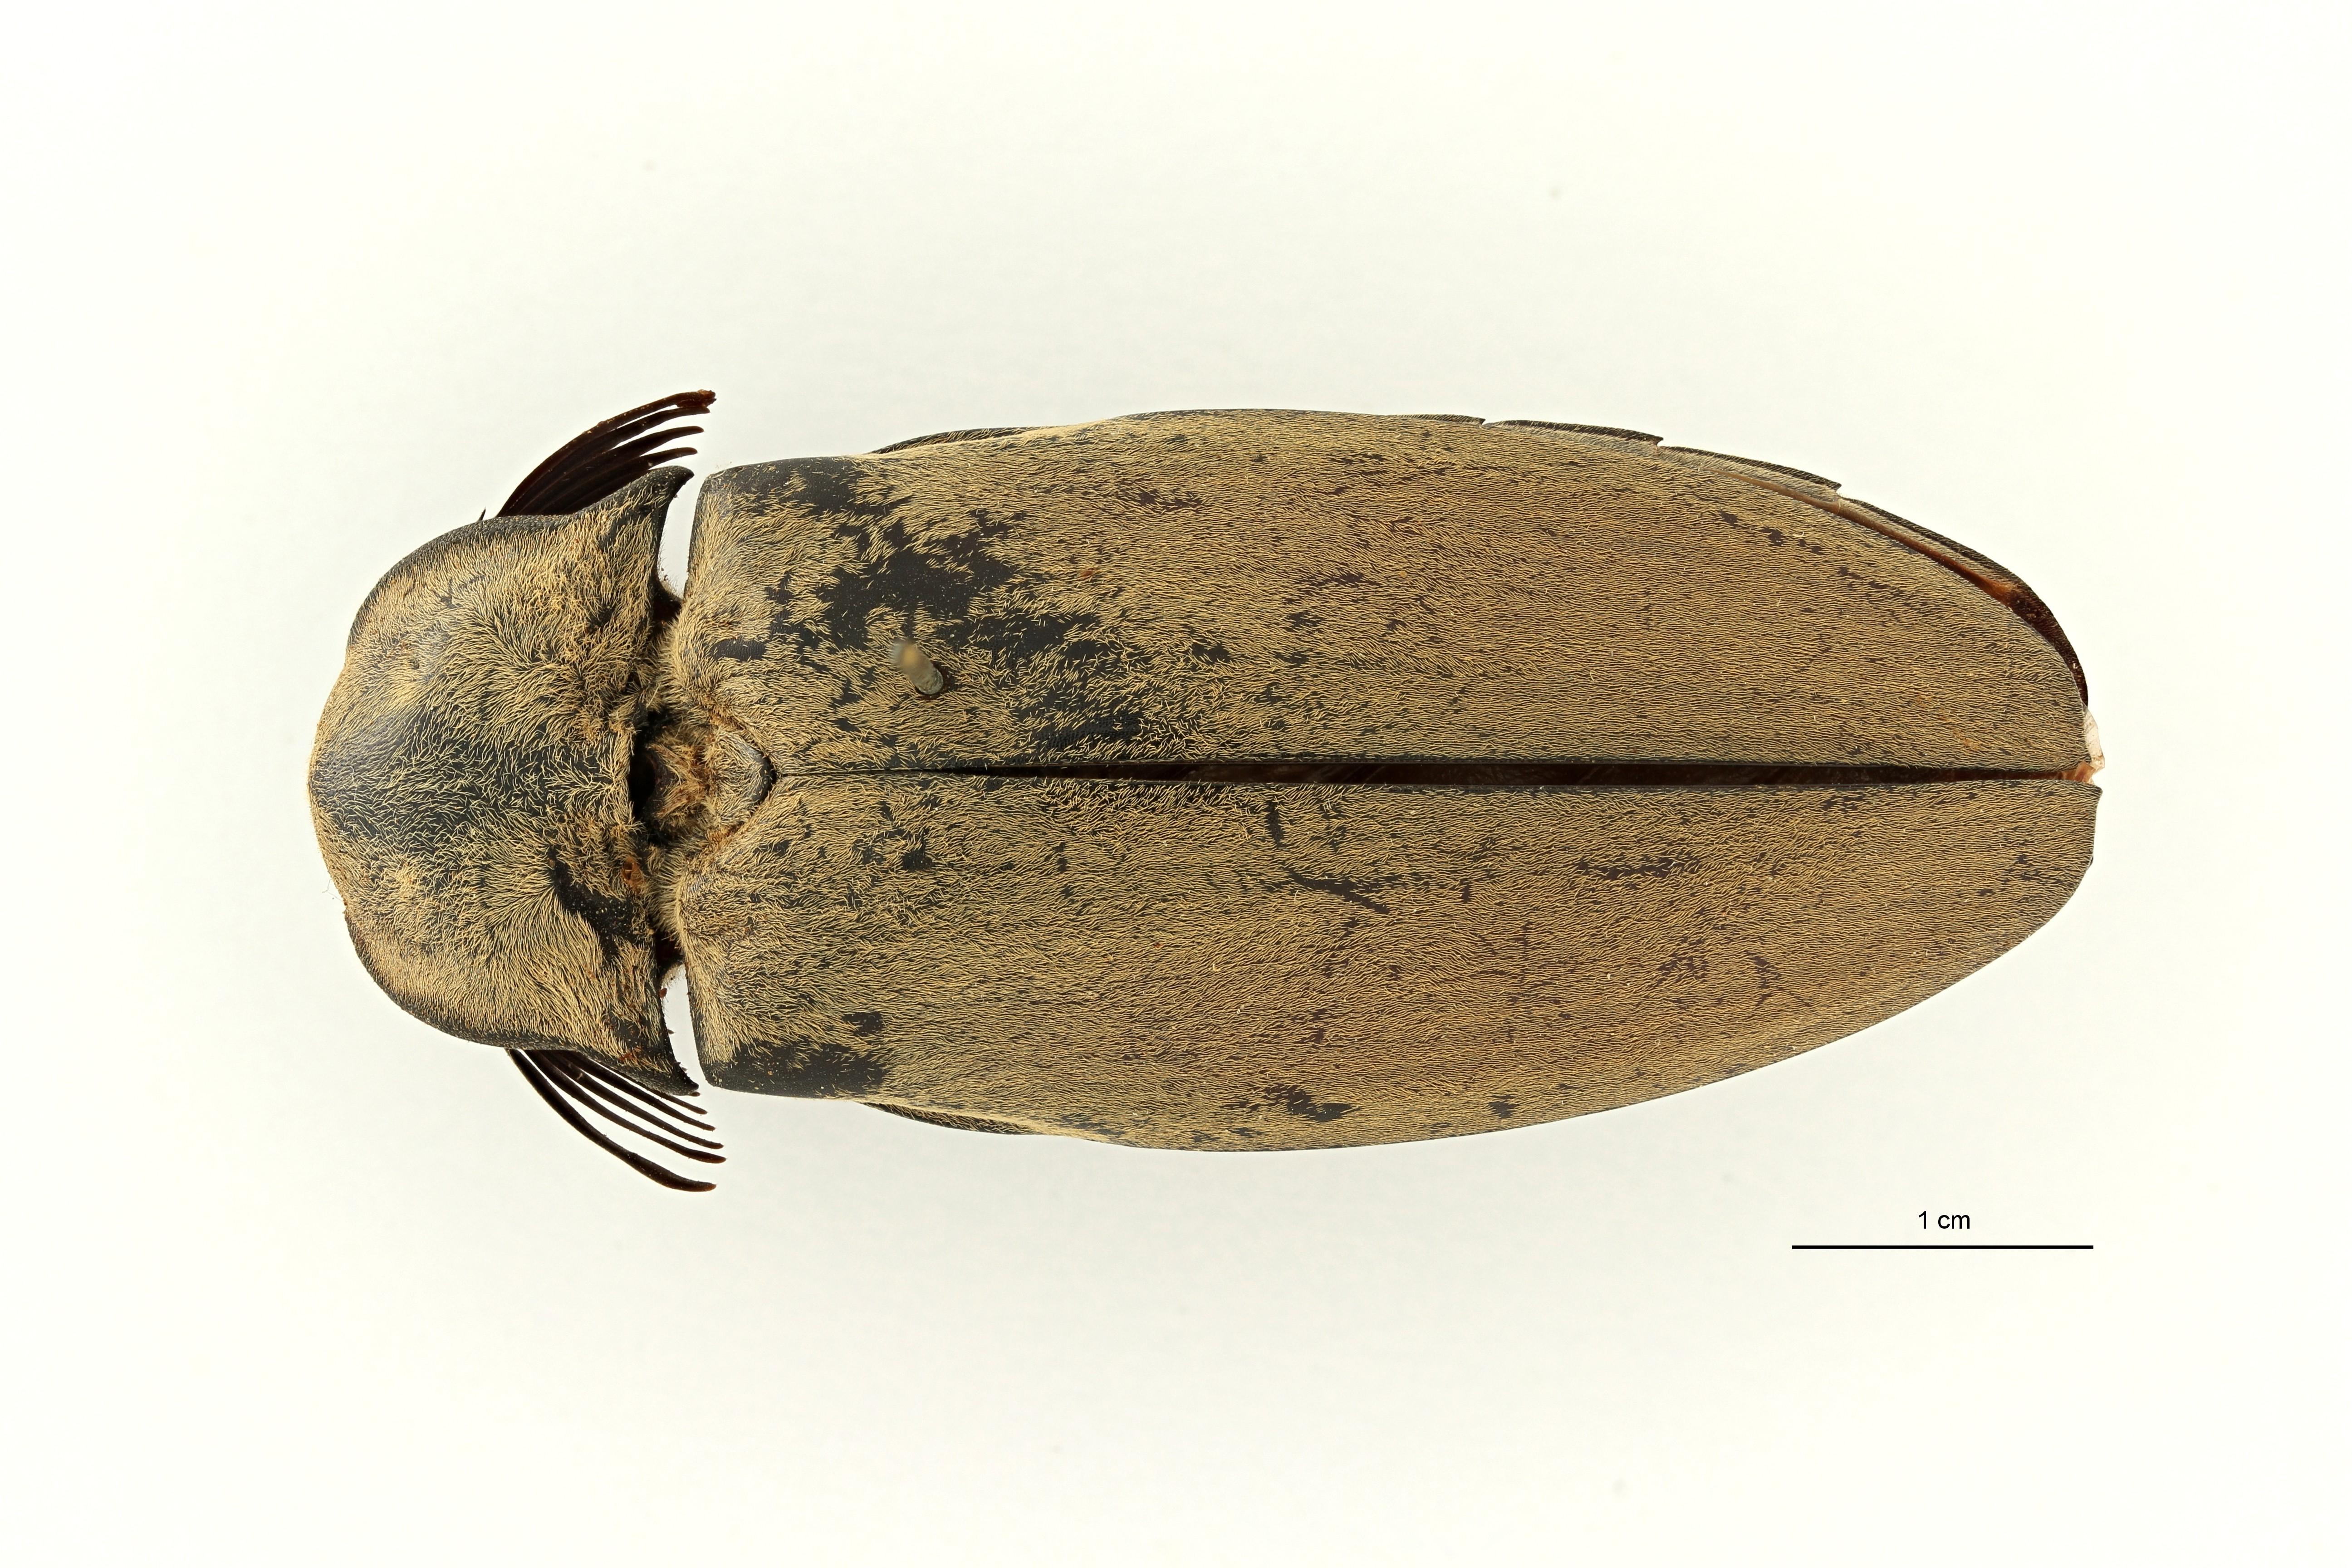 Tetralobus flabellicornis var cinereus t1 D ZS PMax Scaled.jpeg